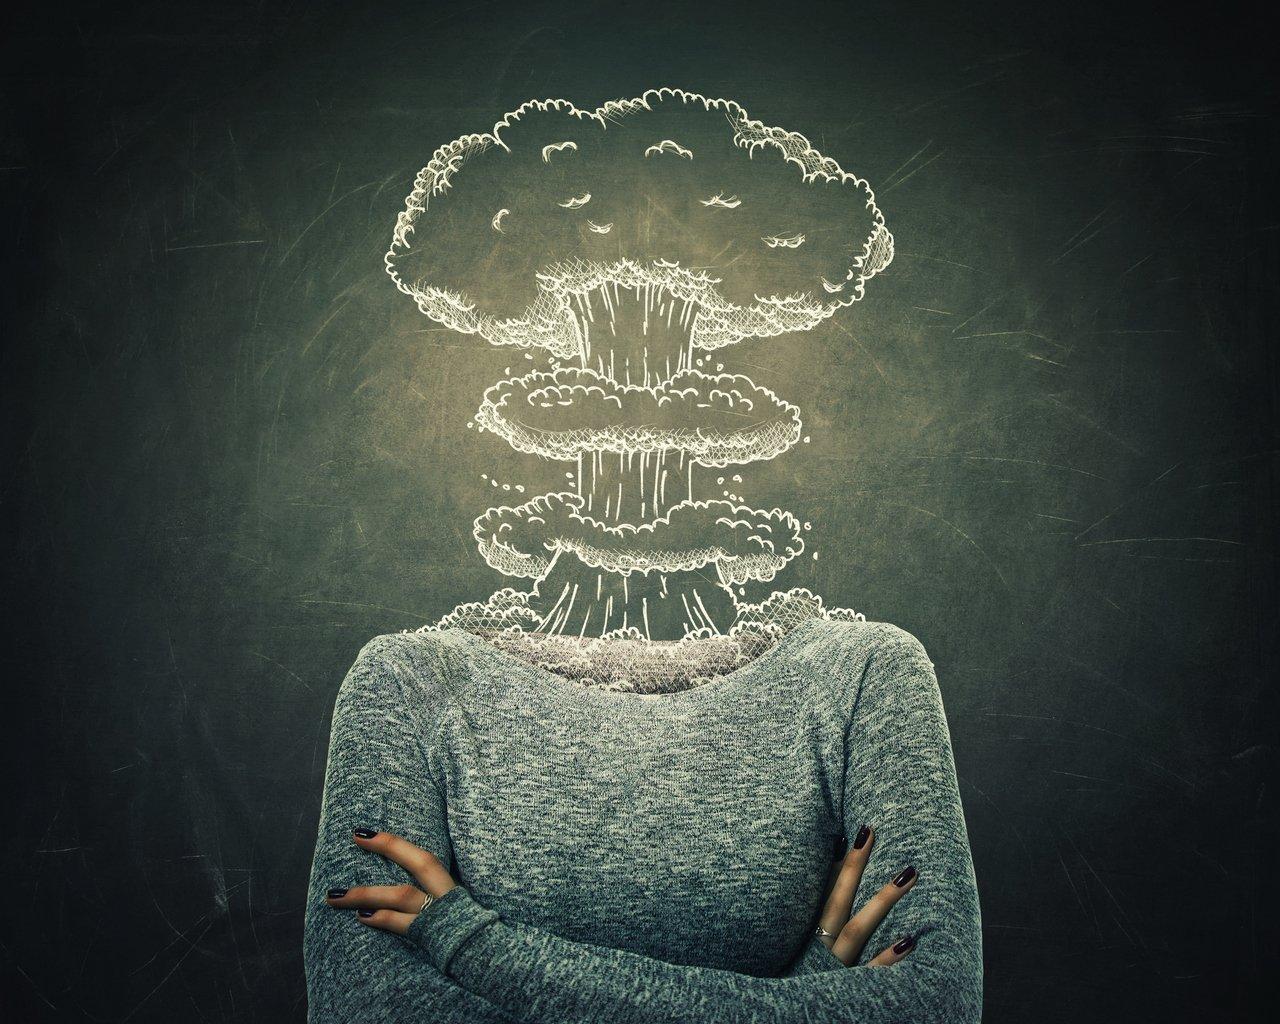 Burnout: a síndrome do esgotamento físico e mental